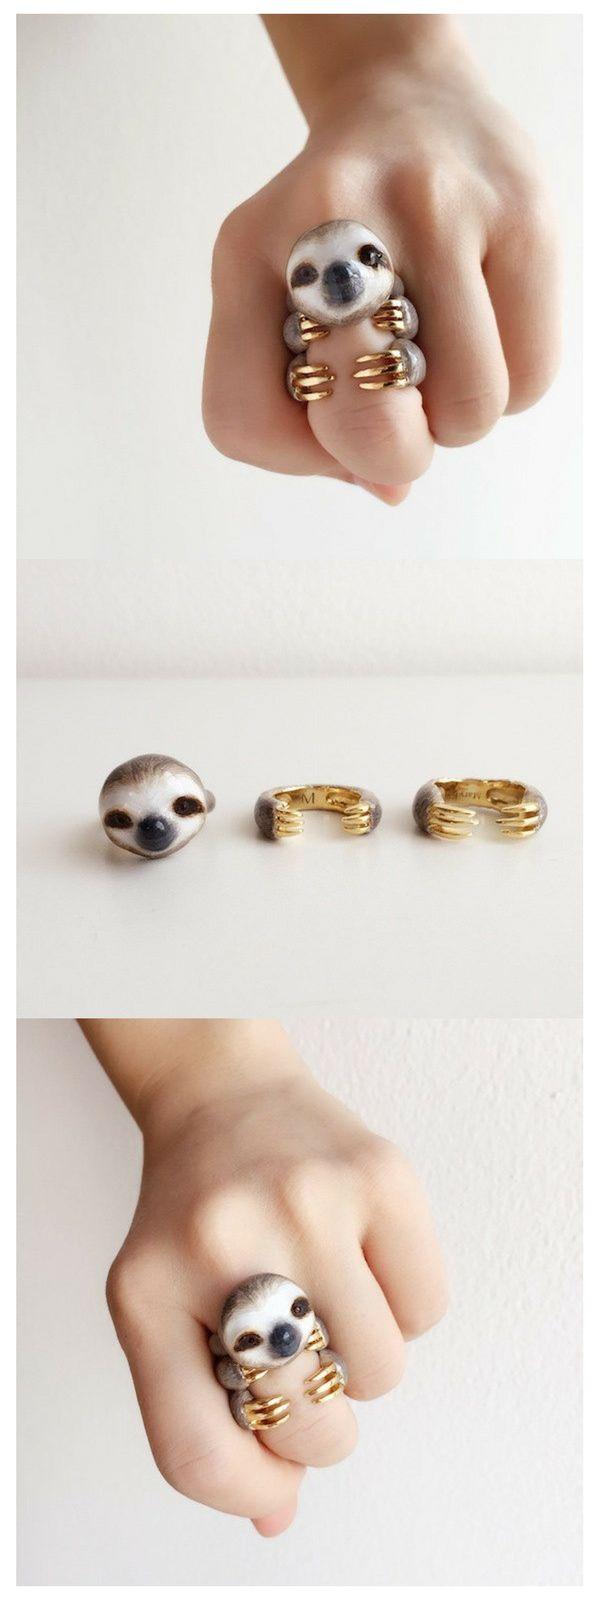 Dieses supersüße Faultier als 3-teiliges Ringset eignet sich perfekt als Geschenk. Doch nicht nur Faultiere auch andere süße Tier Ringe gibt es hier im Shop. Diese handgemachten Ringe sind einfach perfekt als Weihnachtsgeschenk. Der etwas andere Schmuck. This super cute Sloth comes as a 3 piece Ringset and is the perfect handmade gift for Christmas but not only Sloths can be found in the shop. #schmuck #ring #jewlery #ring #accessoires #sloth #faultier #cute #gift